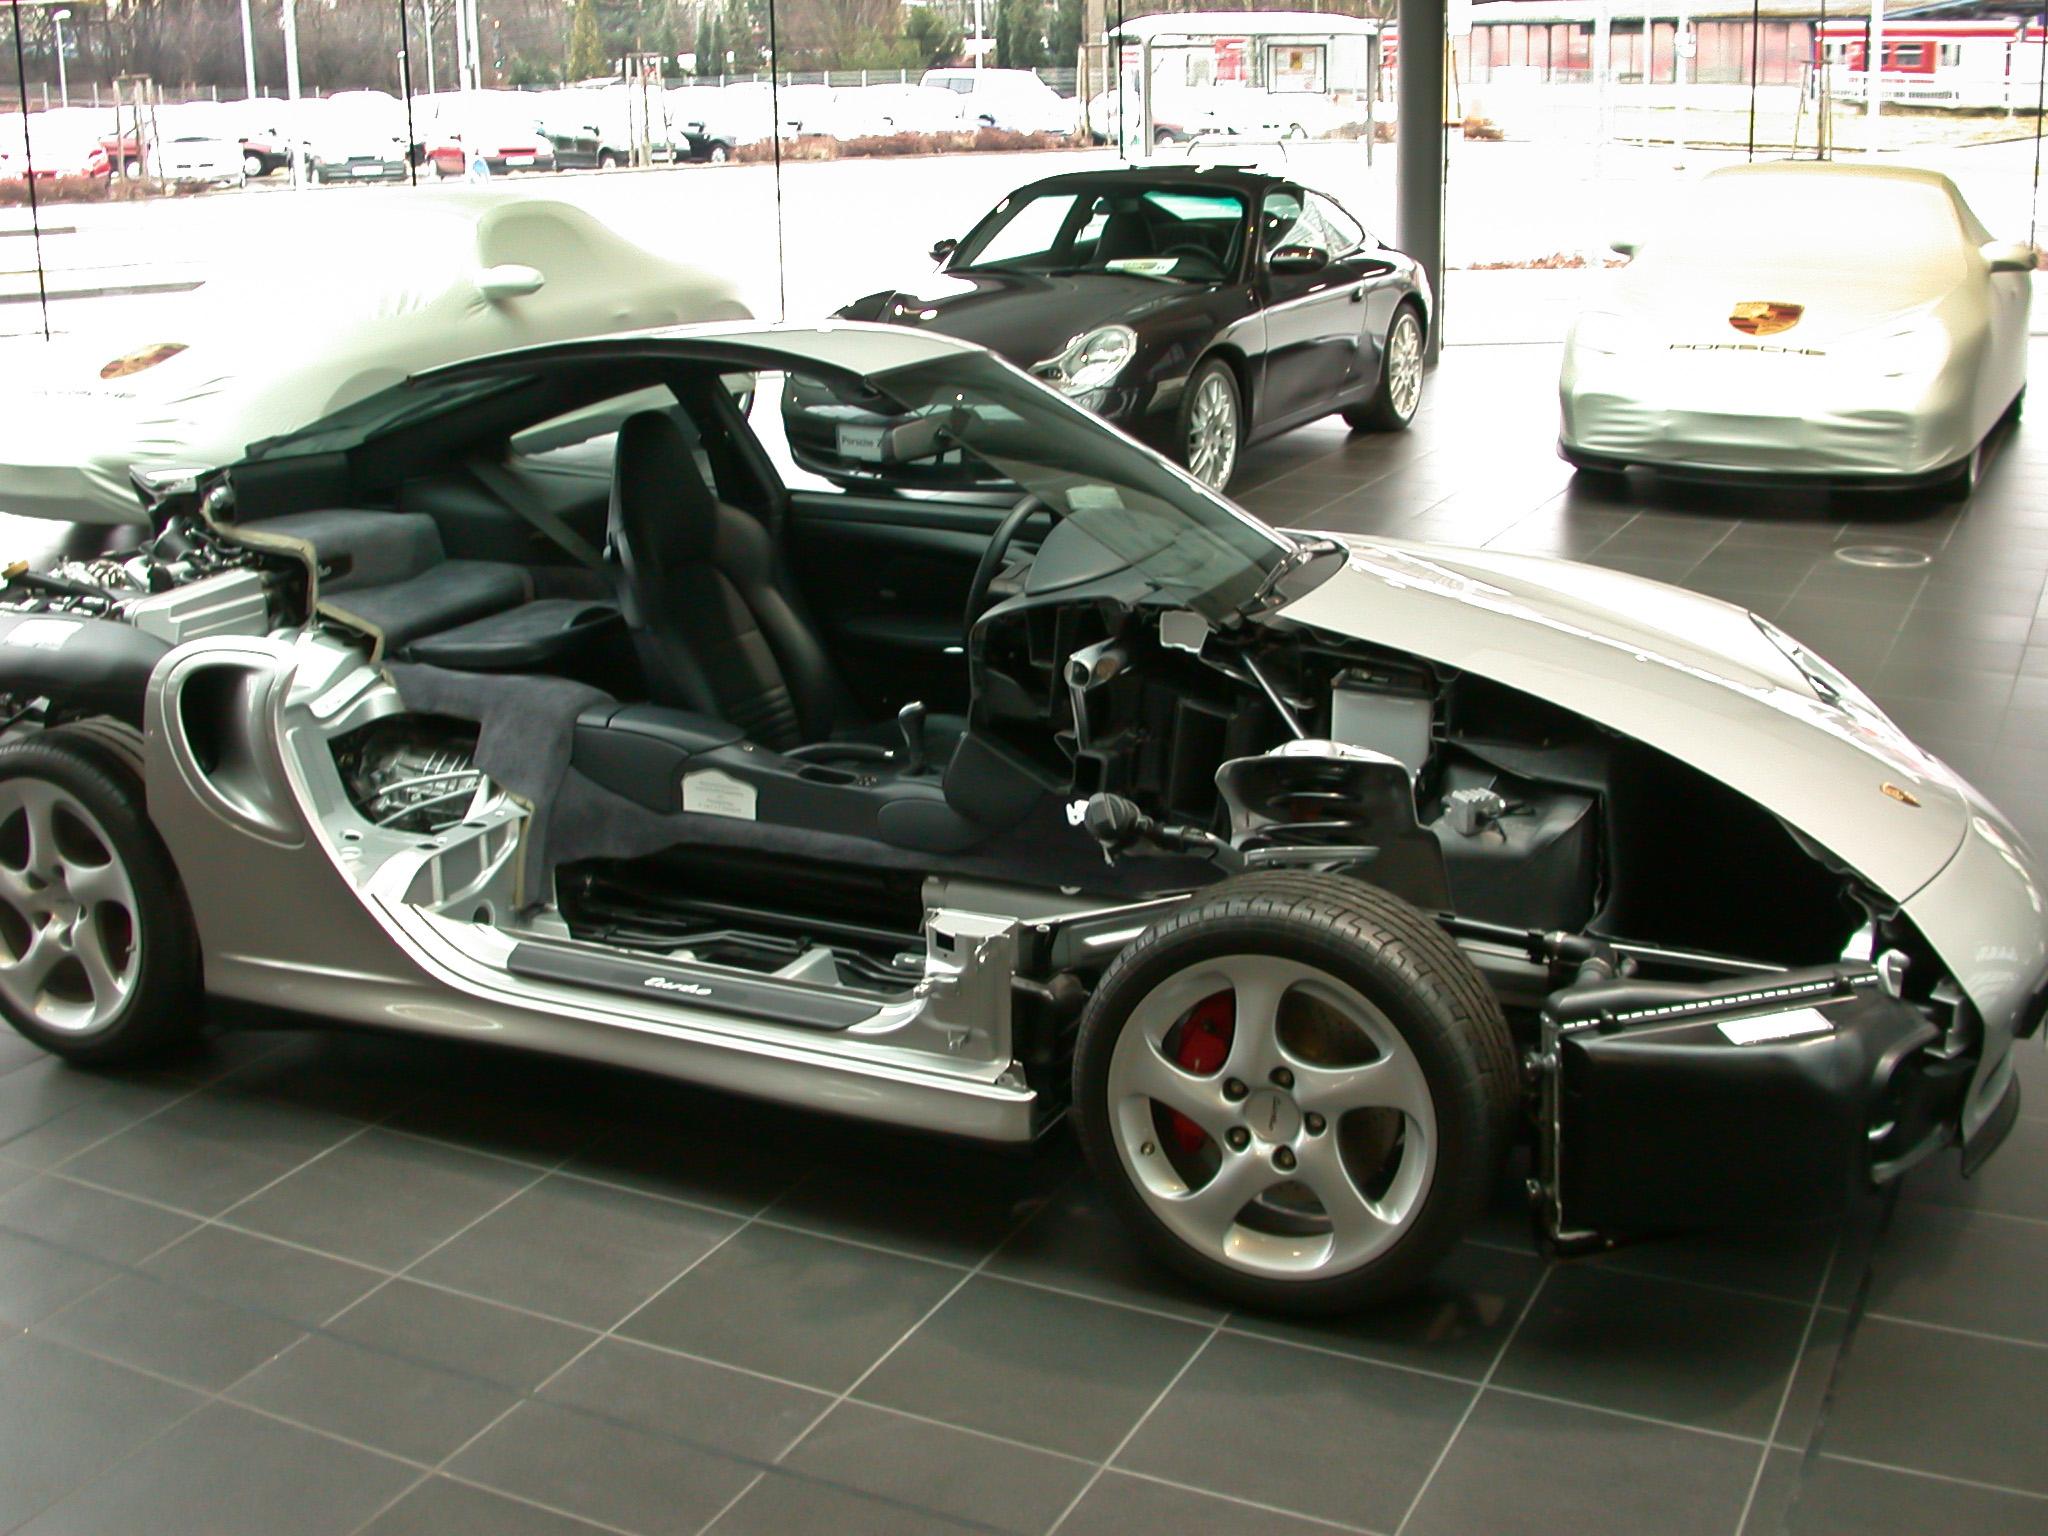 Porsche_911_halbiert_Seite Terrific 2002 Porsche 911 Carrera Turbo Gt2 X50 Cars Trend